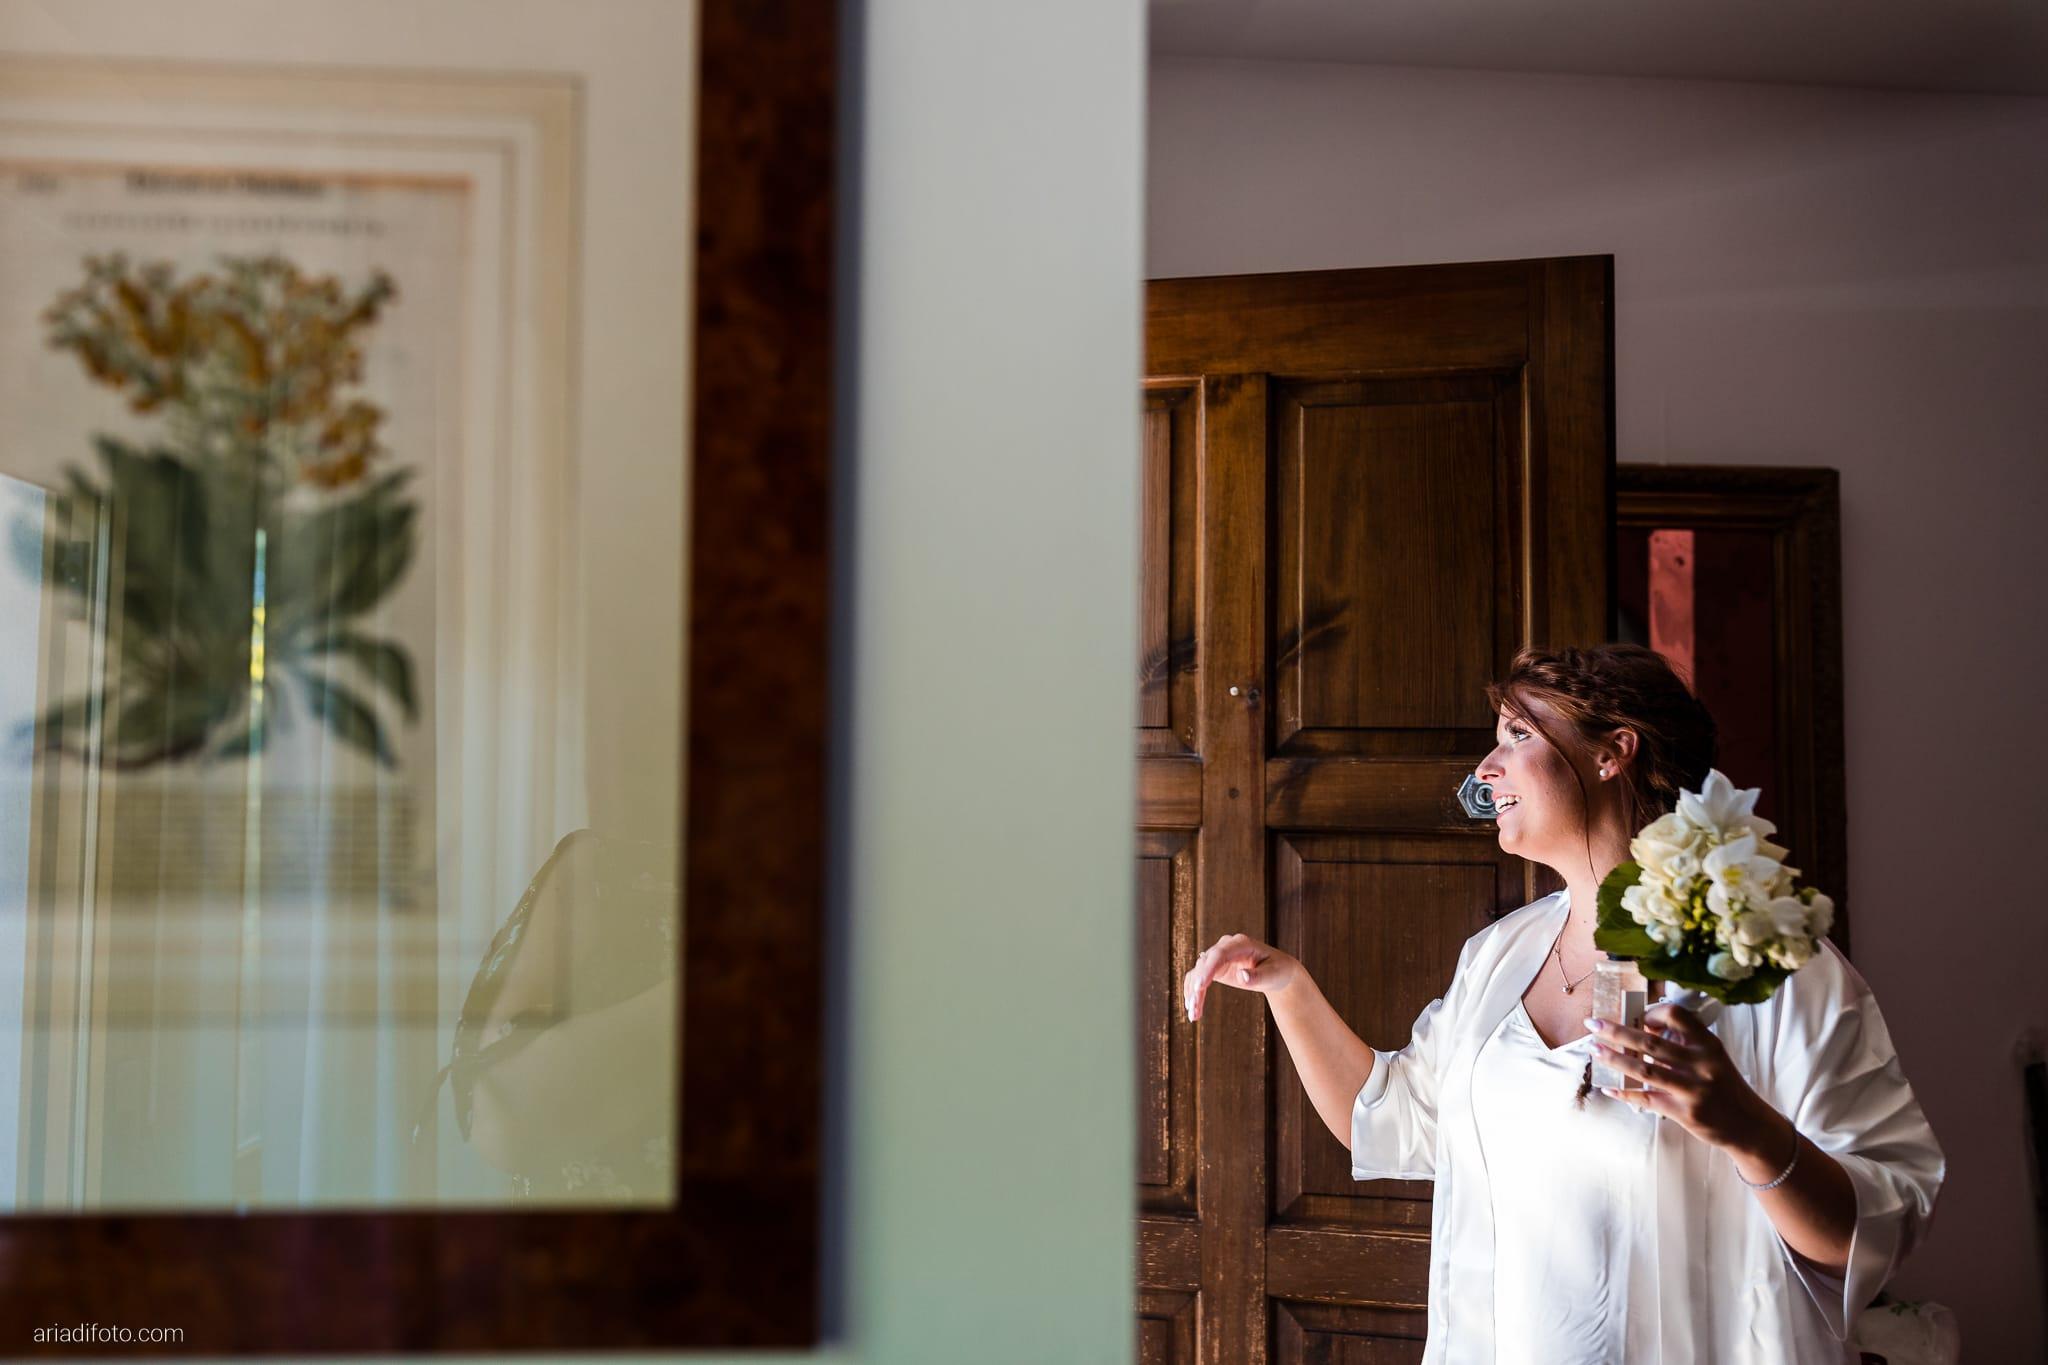 Lavinia Daniele Matrimonio Medea Gorizia Villa Elodia Trivignano Udinese Udine preparativi sposa momenti